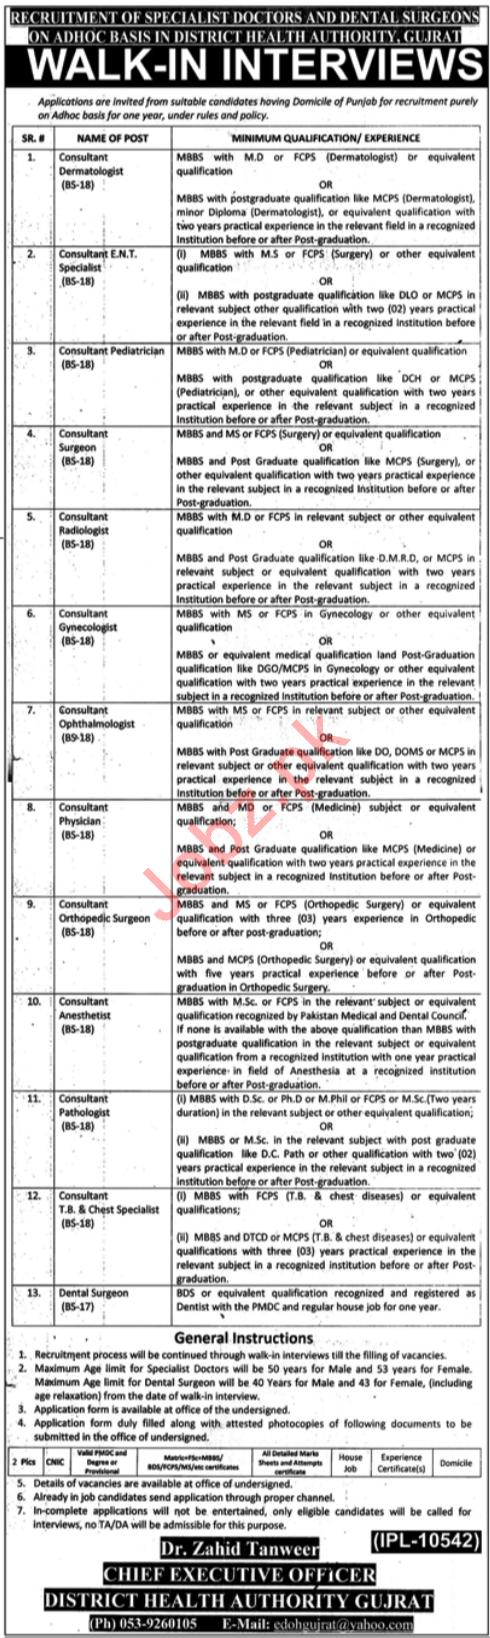 District Health Authority Gujrat Jobs Interview 2019